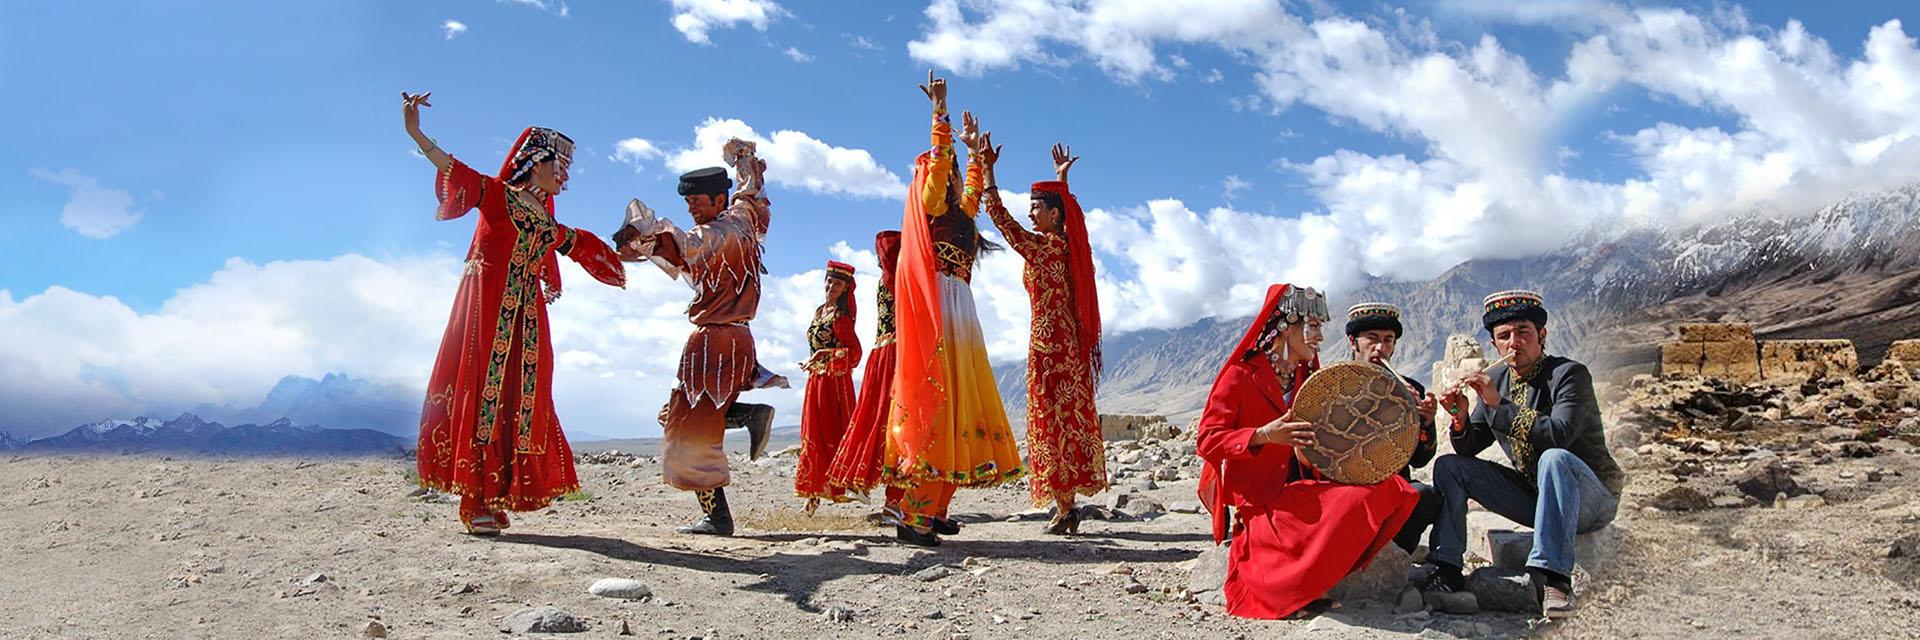 Silk Road Travel Guide